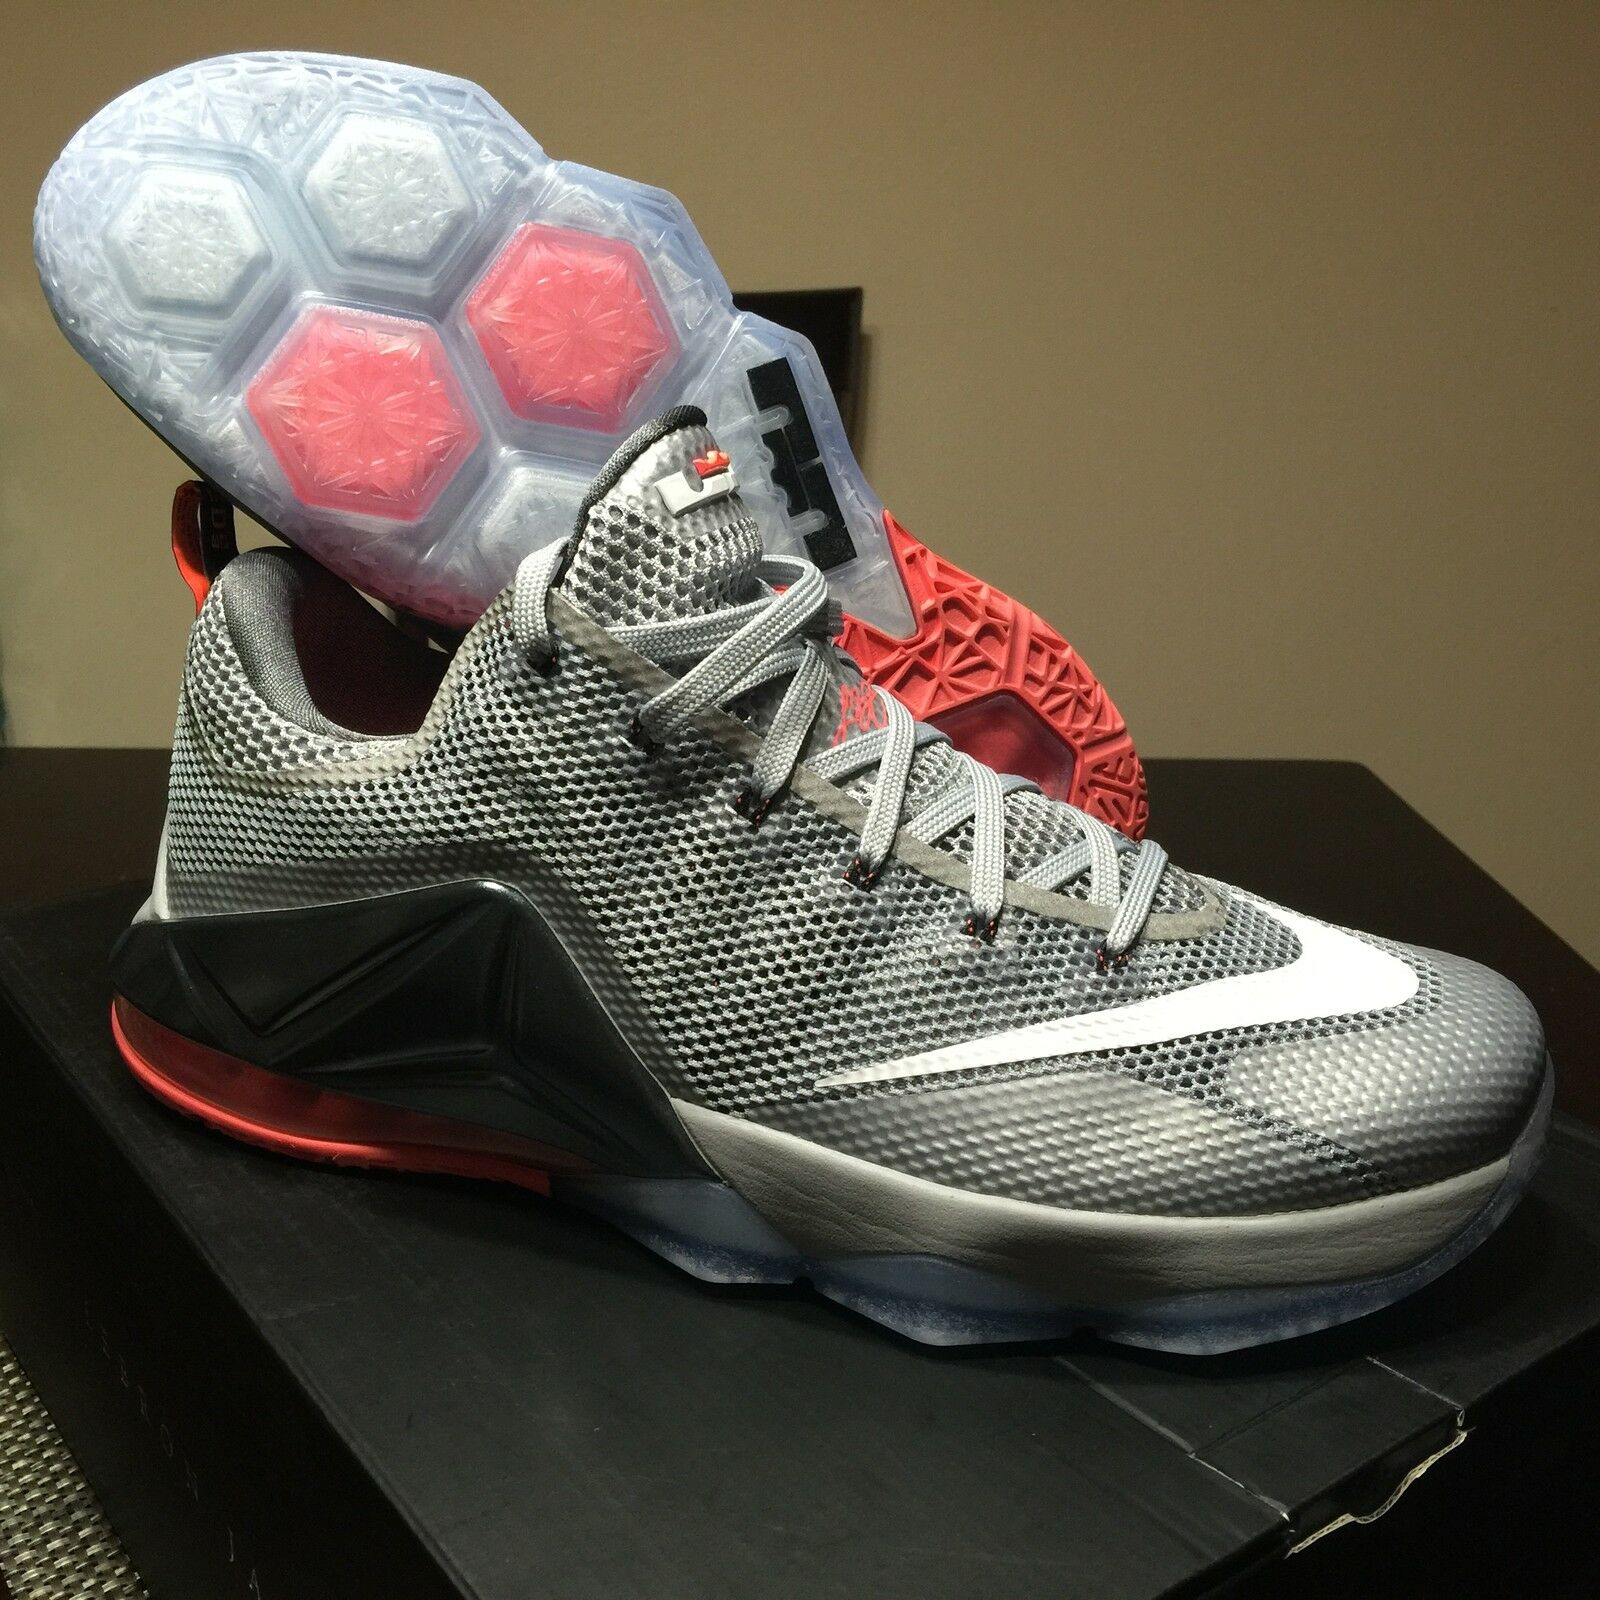 Nike air lebron xii 13 - 8 elite silver chrome rosa palmer rosso 12 11 10 tappo